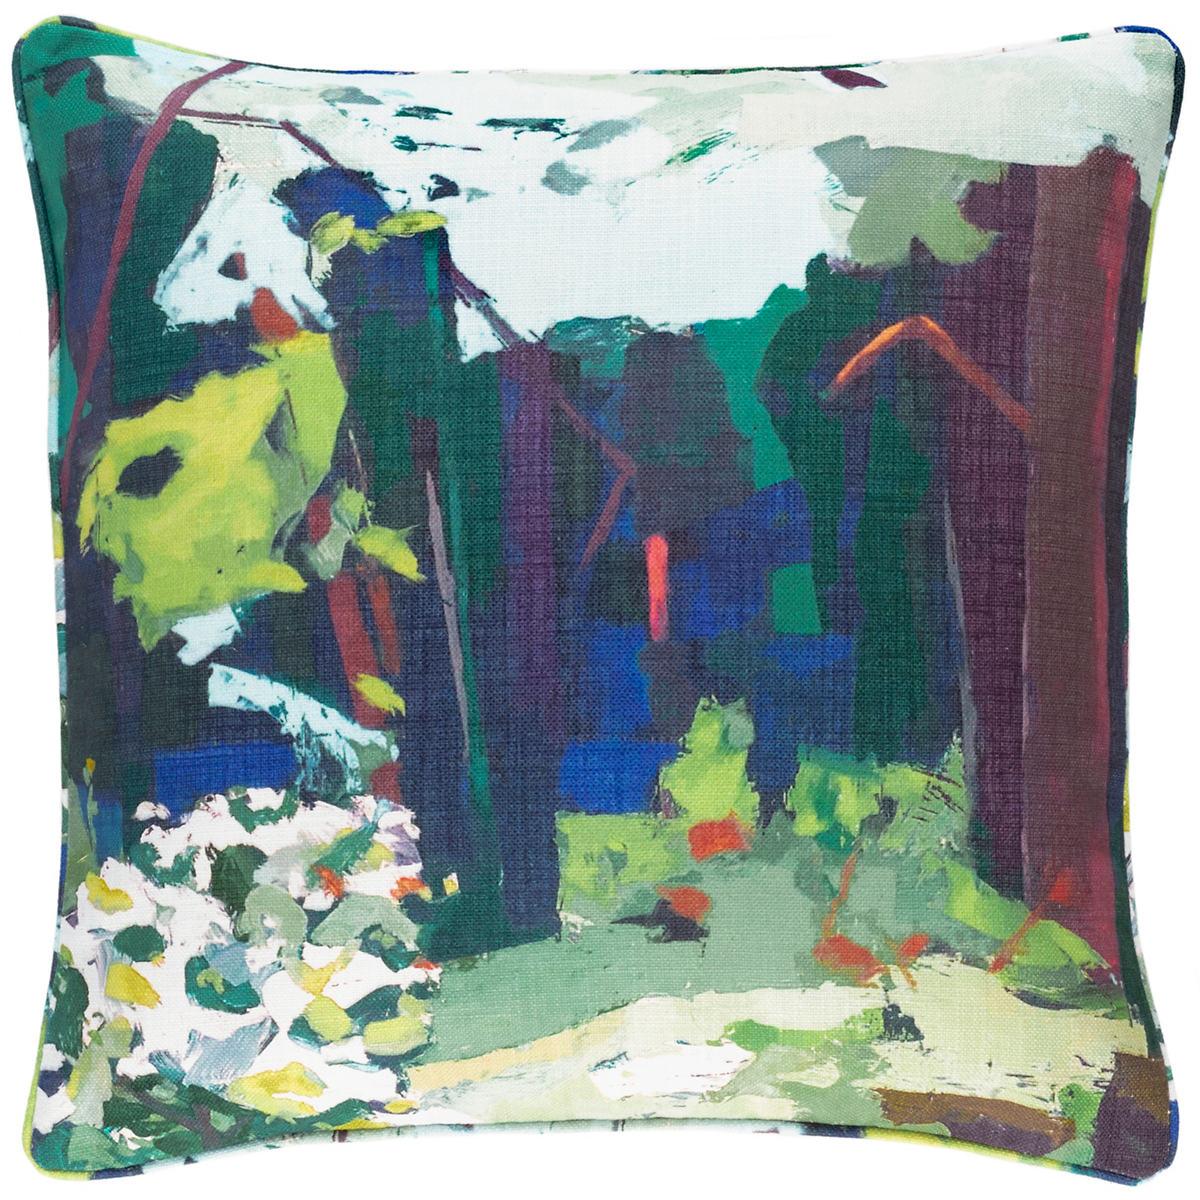 Into The Woods Indoor/Outdoor Decorative Pillow